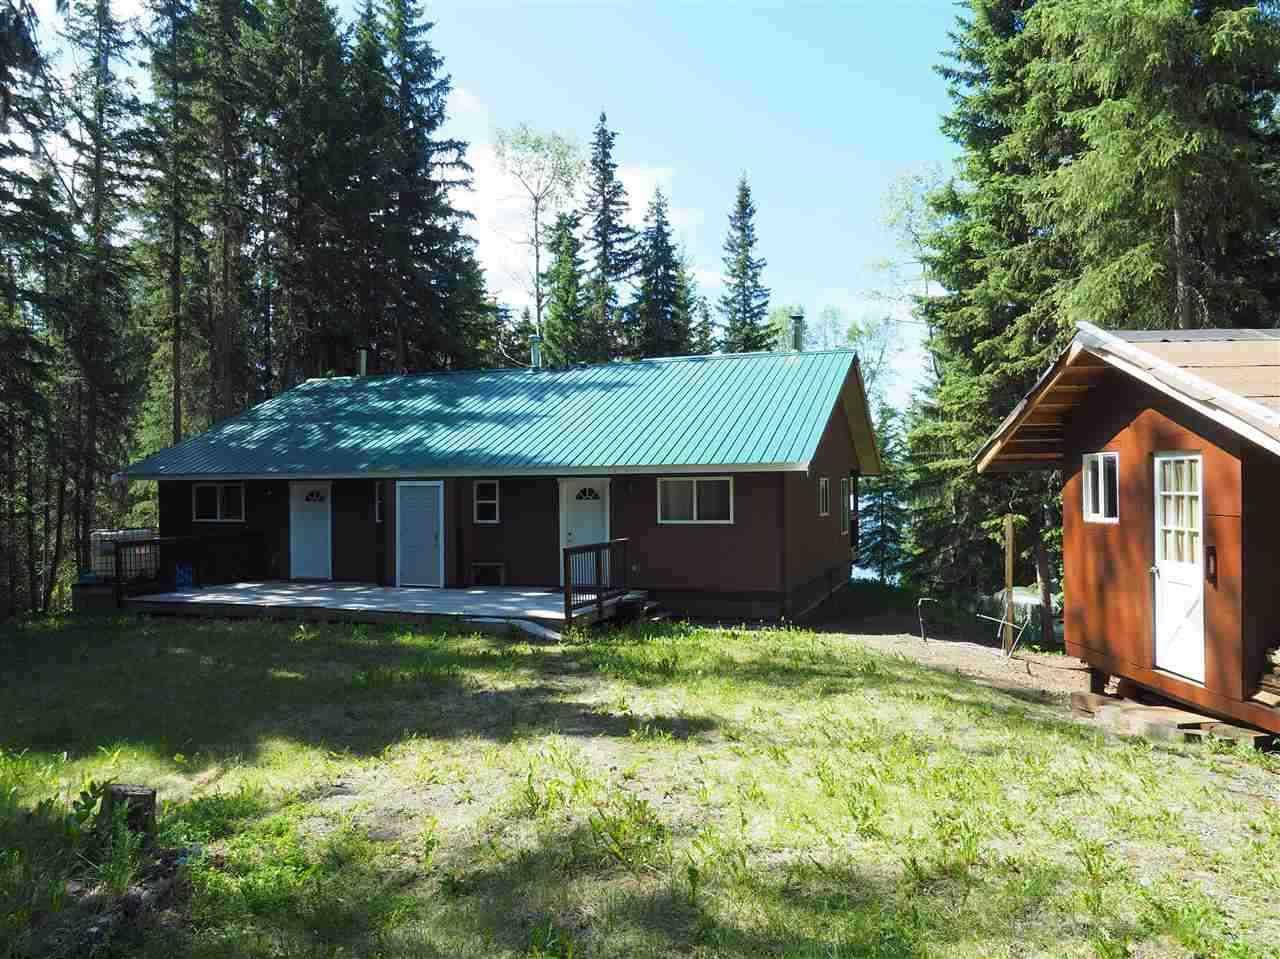 Photo 31: Photos: 8222 CENTENNIAL Road in Bridge Lake: Bridge Lake/Sheridan Lake House for sale (100 Mile House (Zone 10))  : MLS®# R2457362